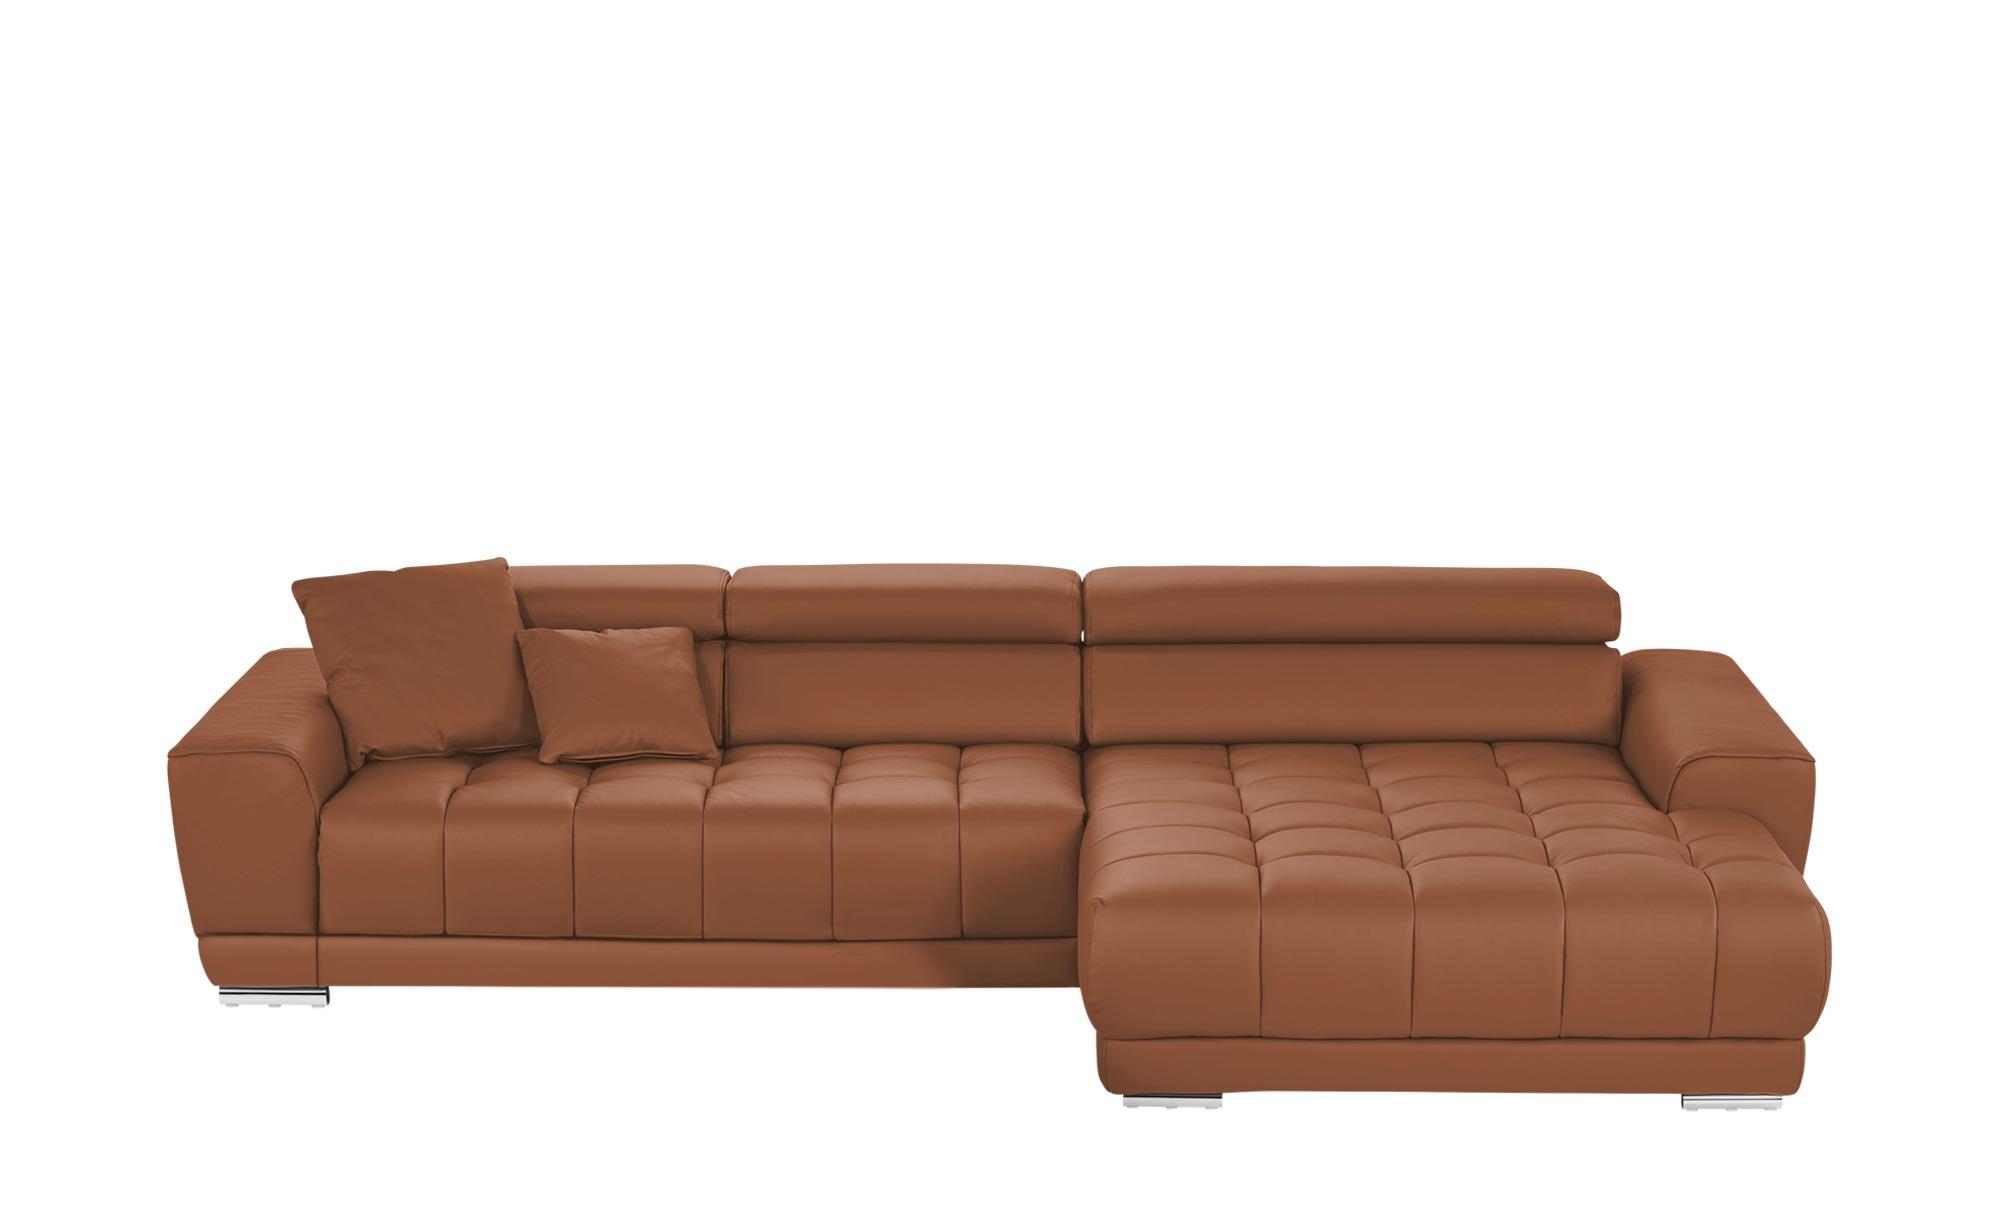 Top Ergebnis 50 Genial sofa Halbrund Leder Grafiken 2018 Hdj5 2017